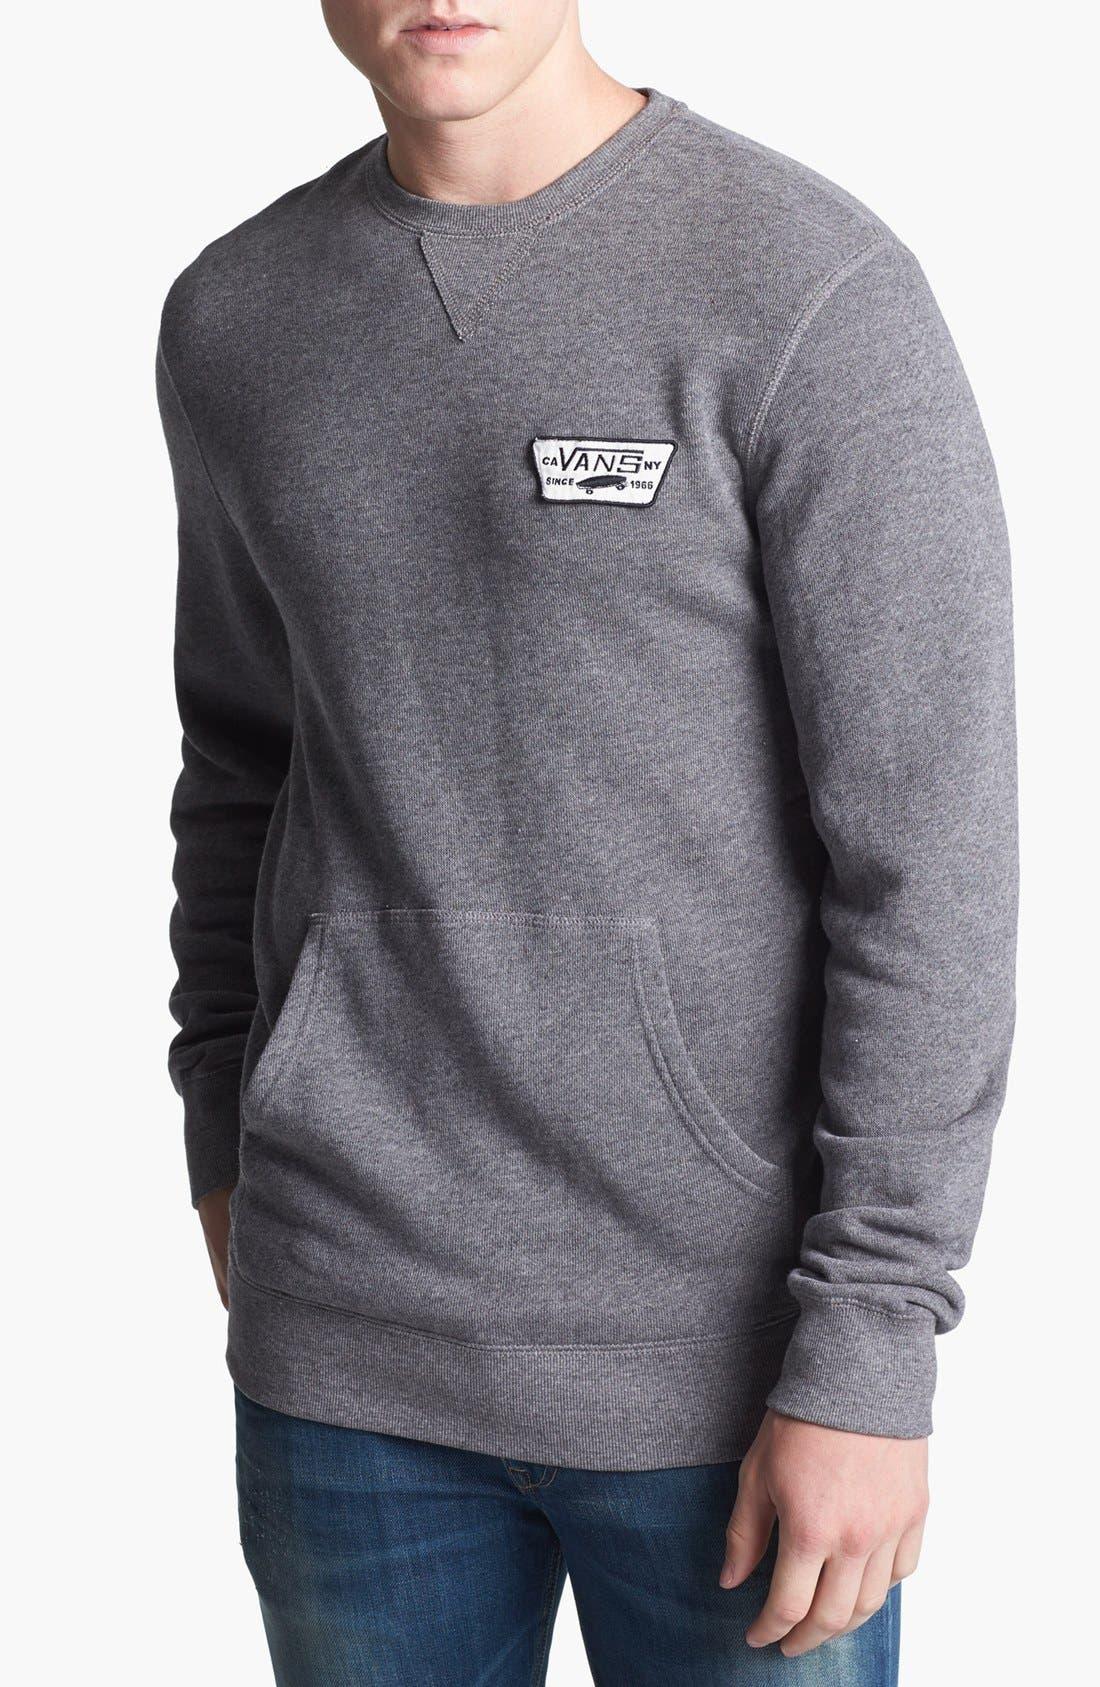 Alternate Image 1 Selected - Vans 'Garnet' Crewneck Sweatshirt